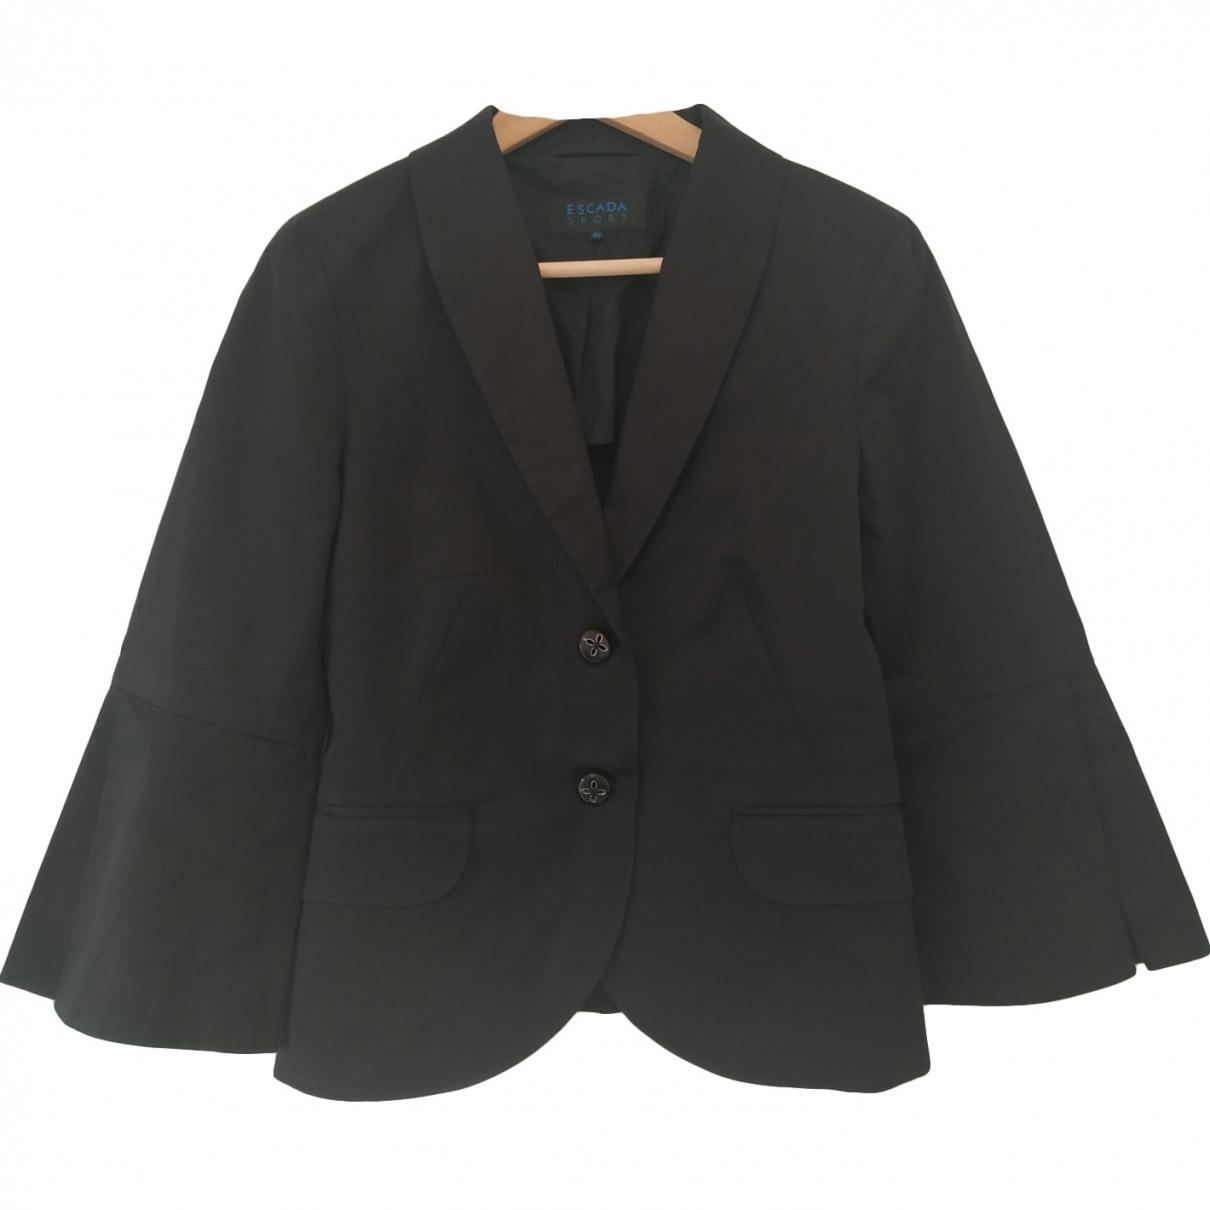 Escada - Veste   pour femme en coton - noir